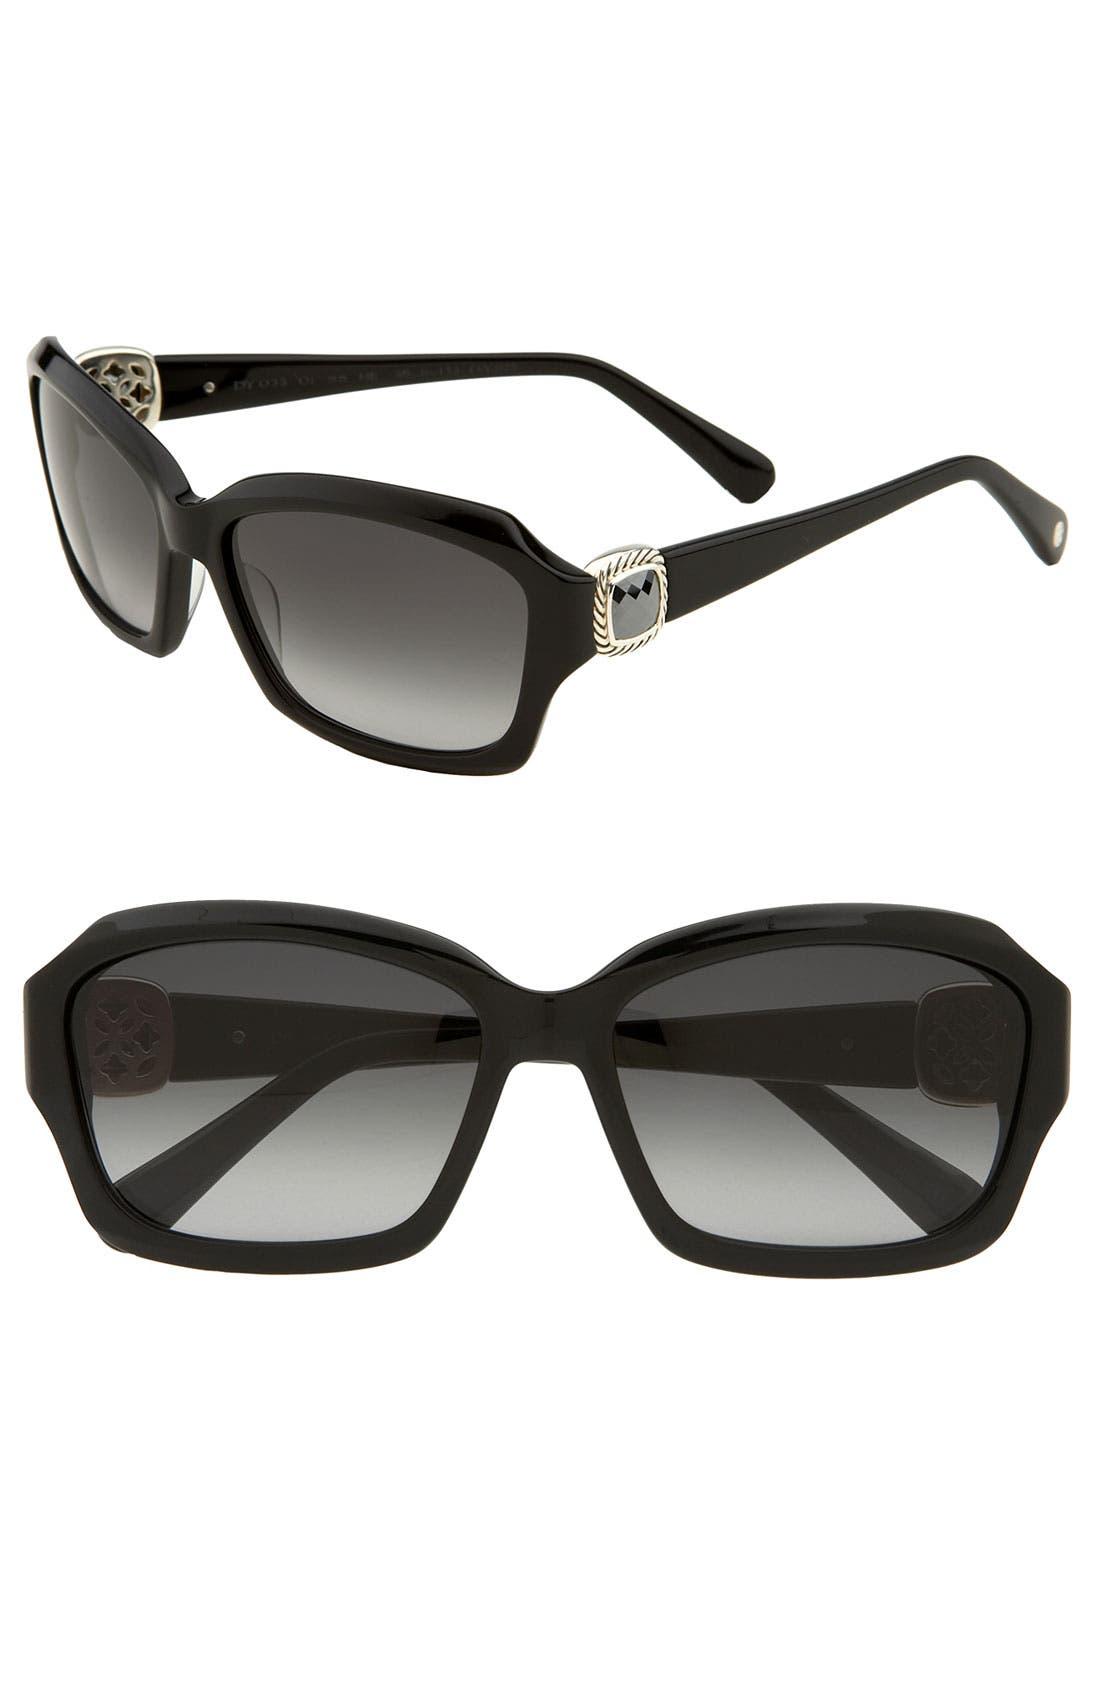 DAVID YURMAN,                             'Albion' Geometric Sunglasses,                             Main thumbnail 1, color,                             001